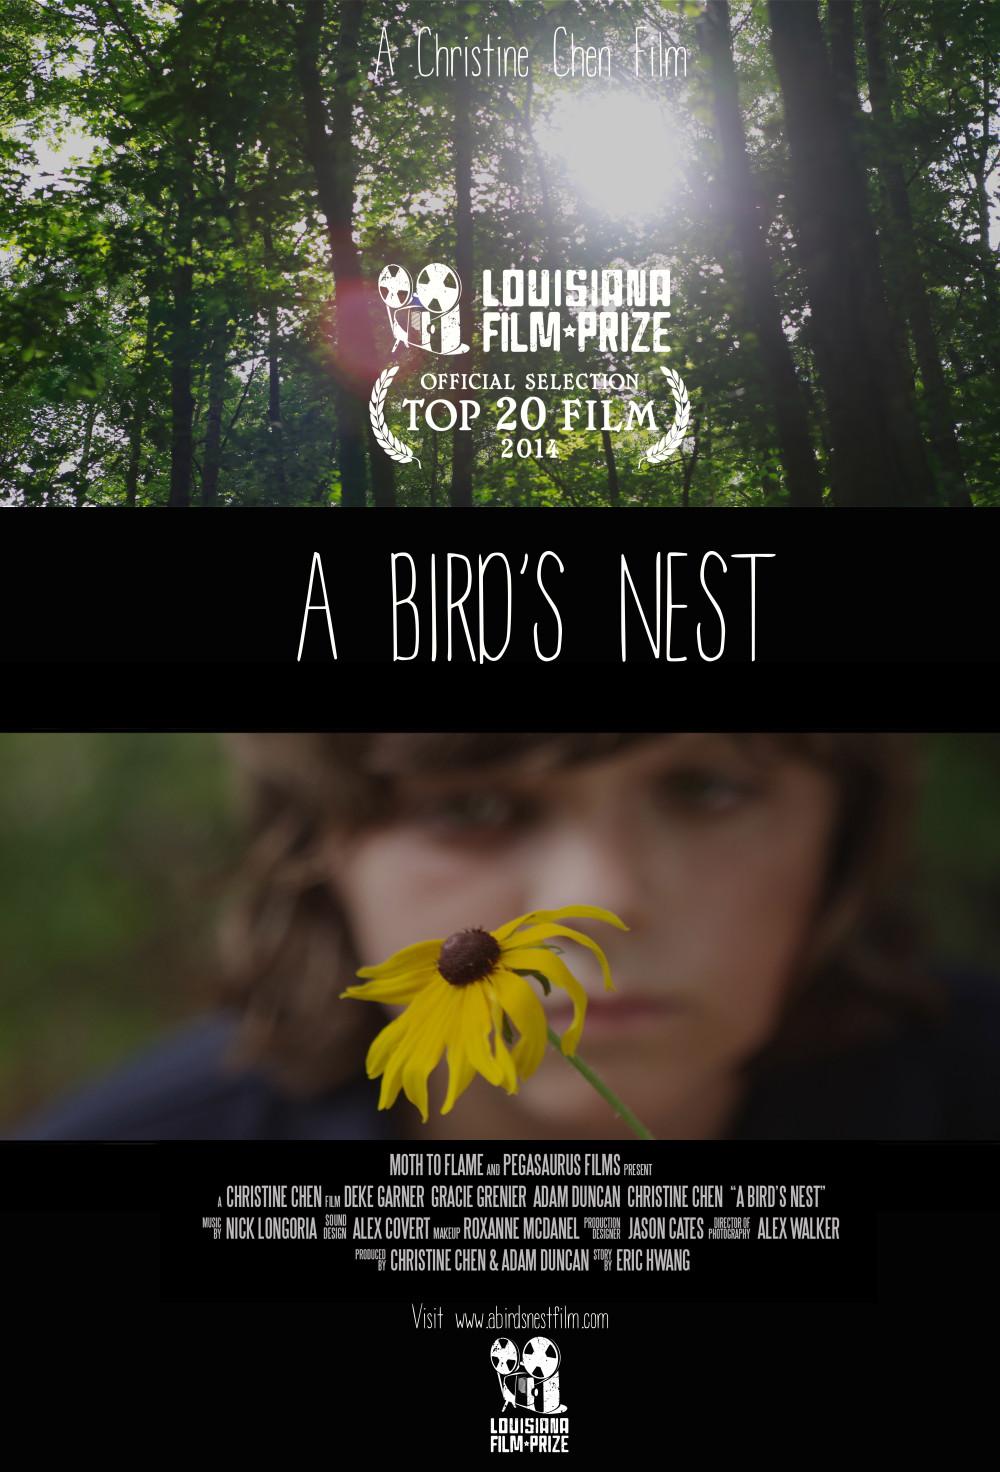 A-Birds-Nest-Still-4-e1408501142230